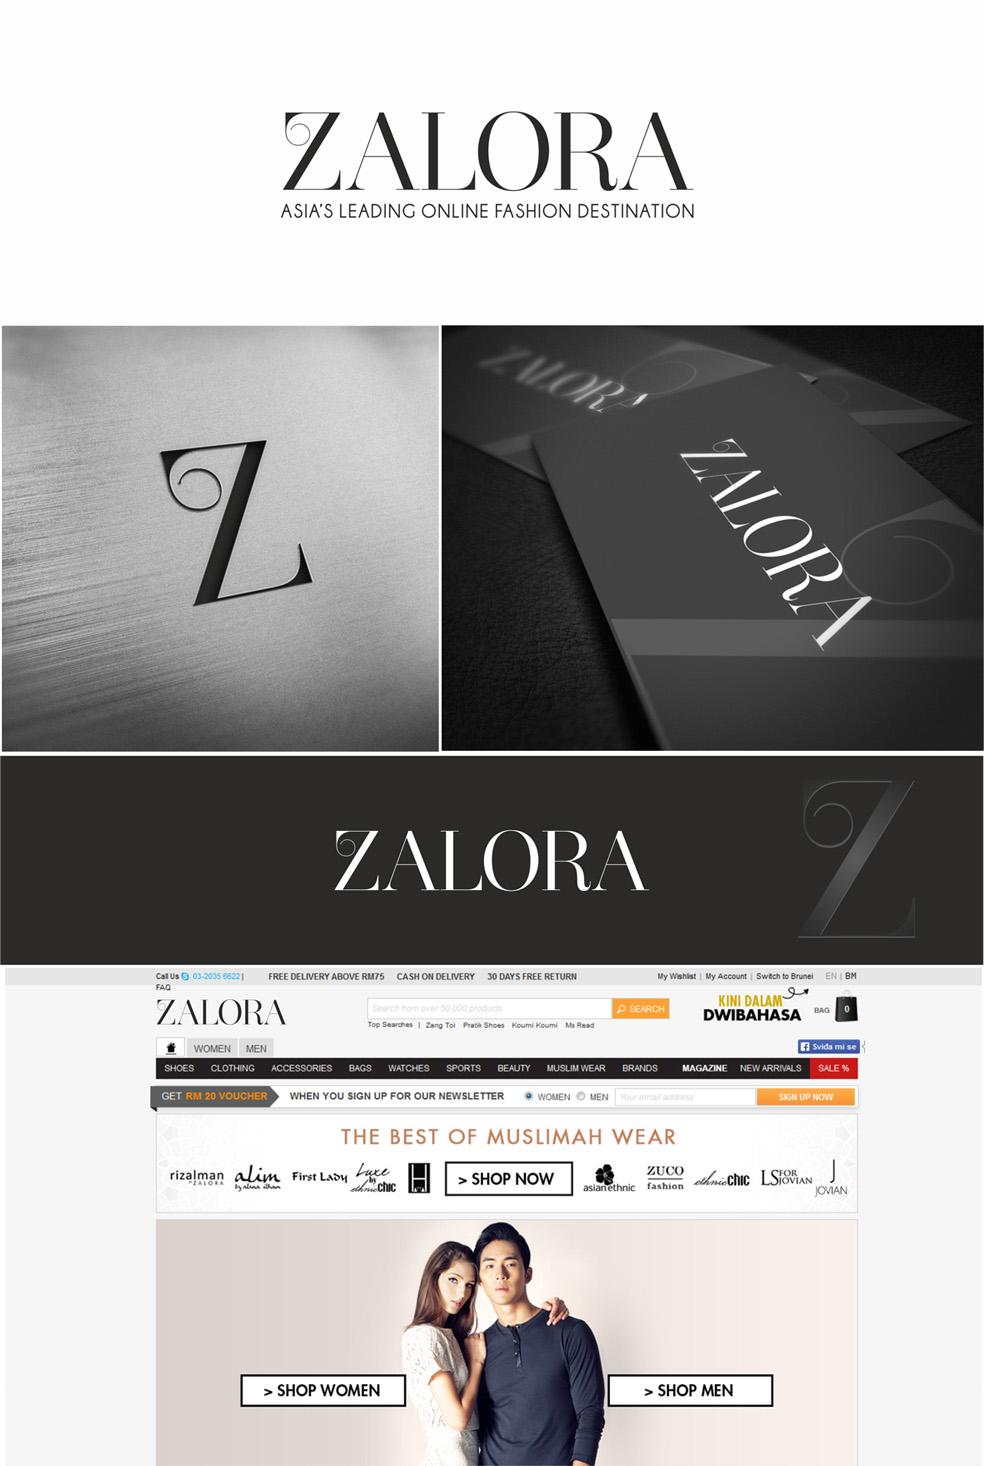 Fashion Logo Design For Zalora By Goreta Design Design 3228142